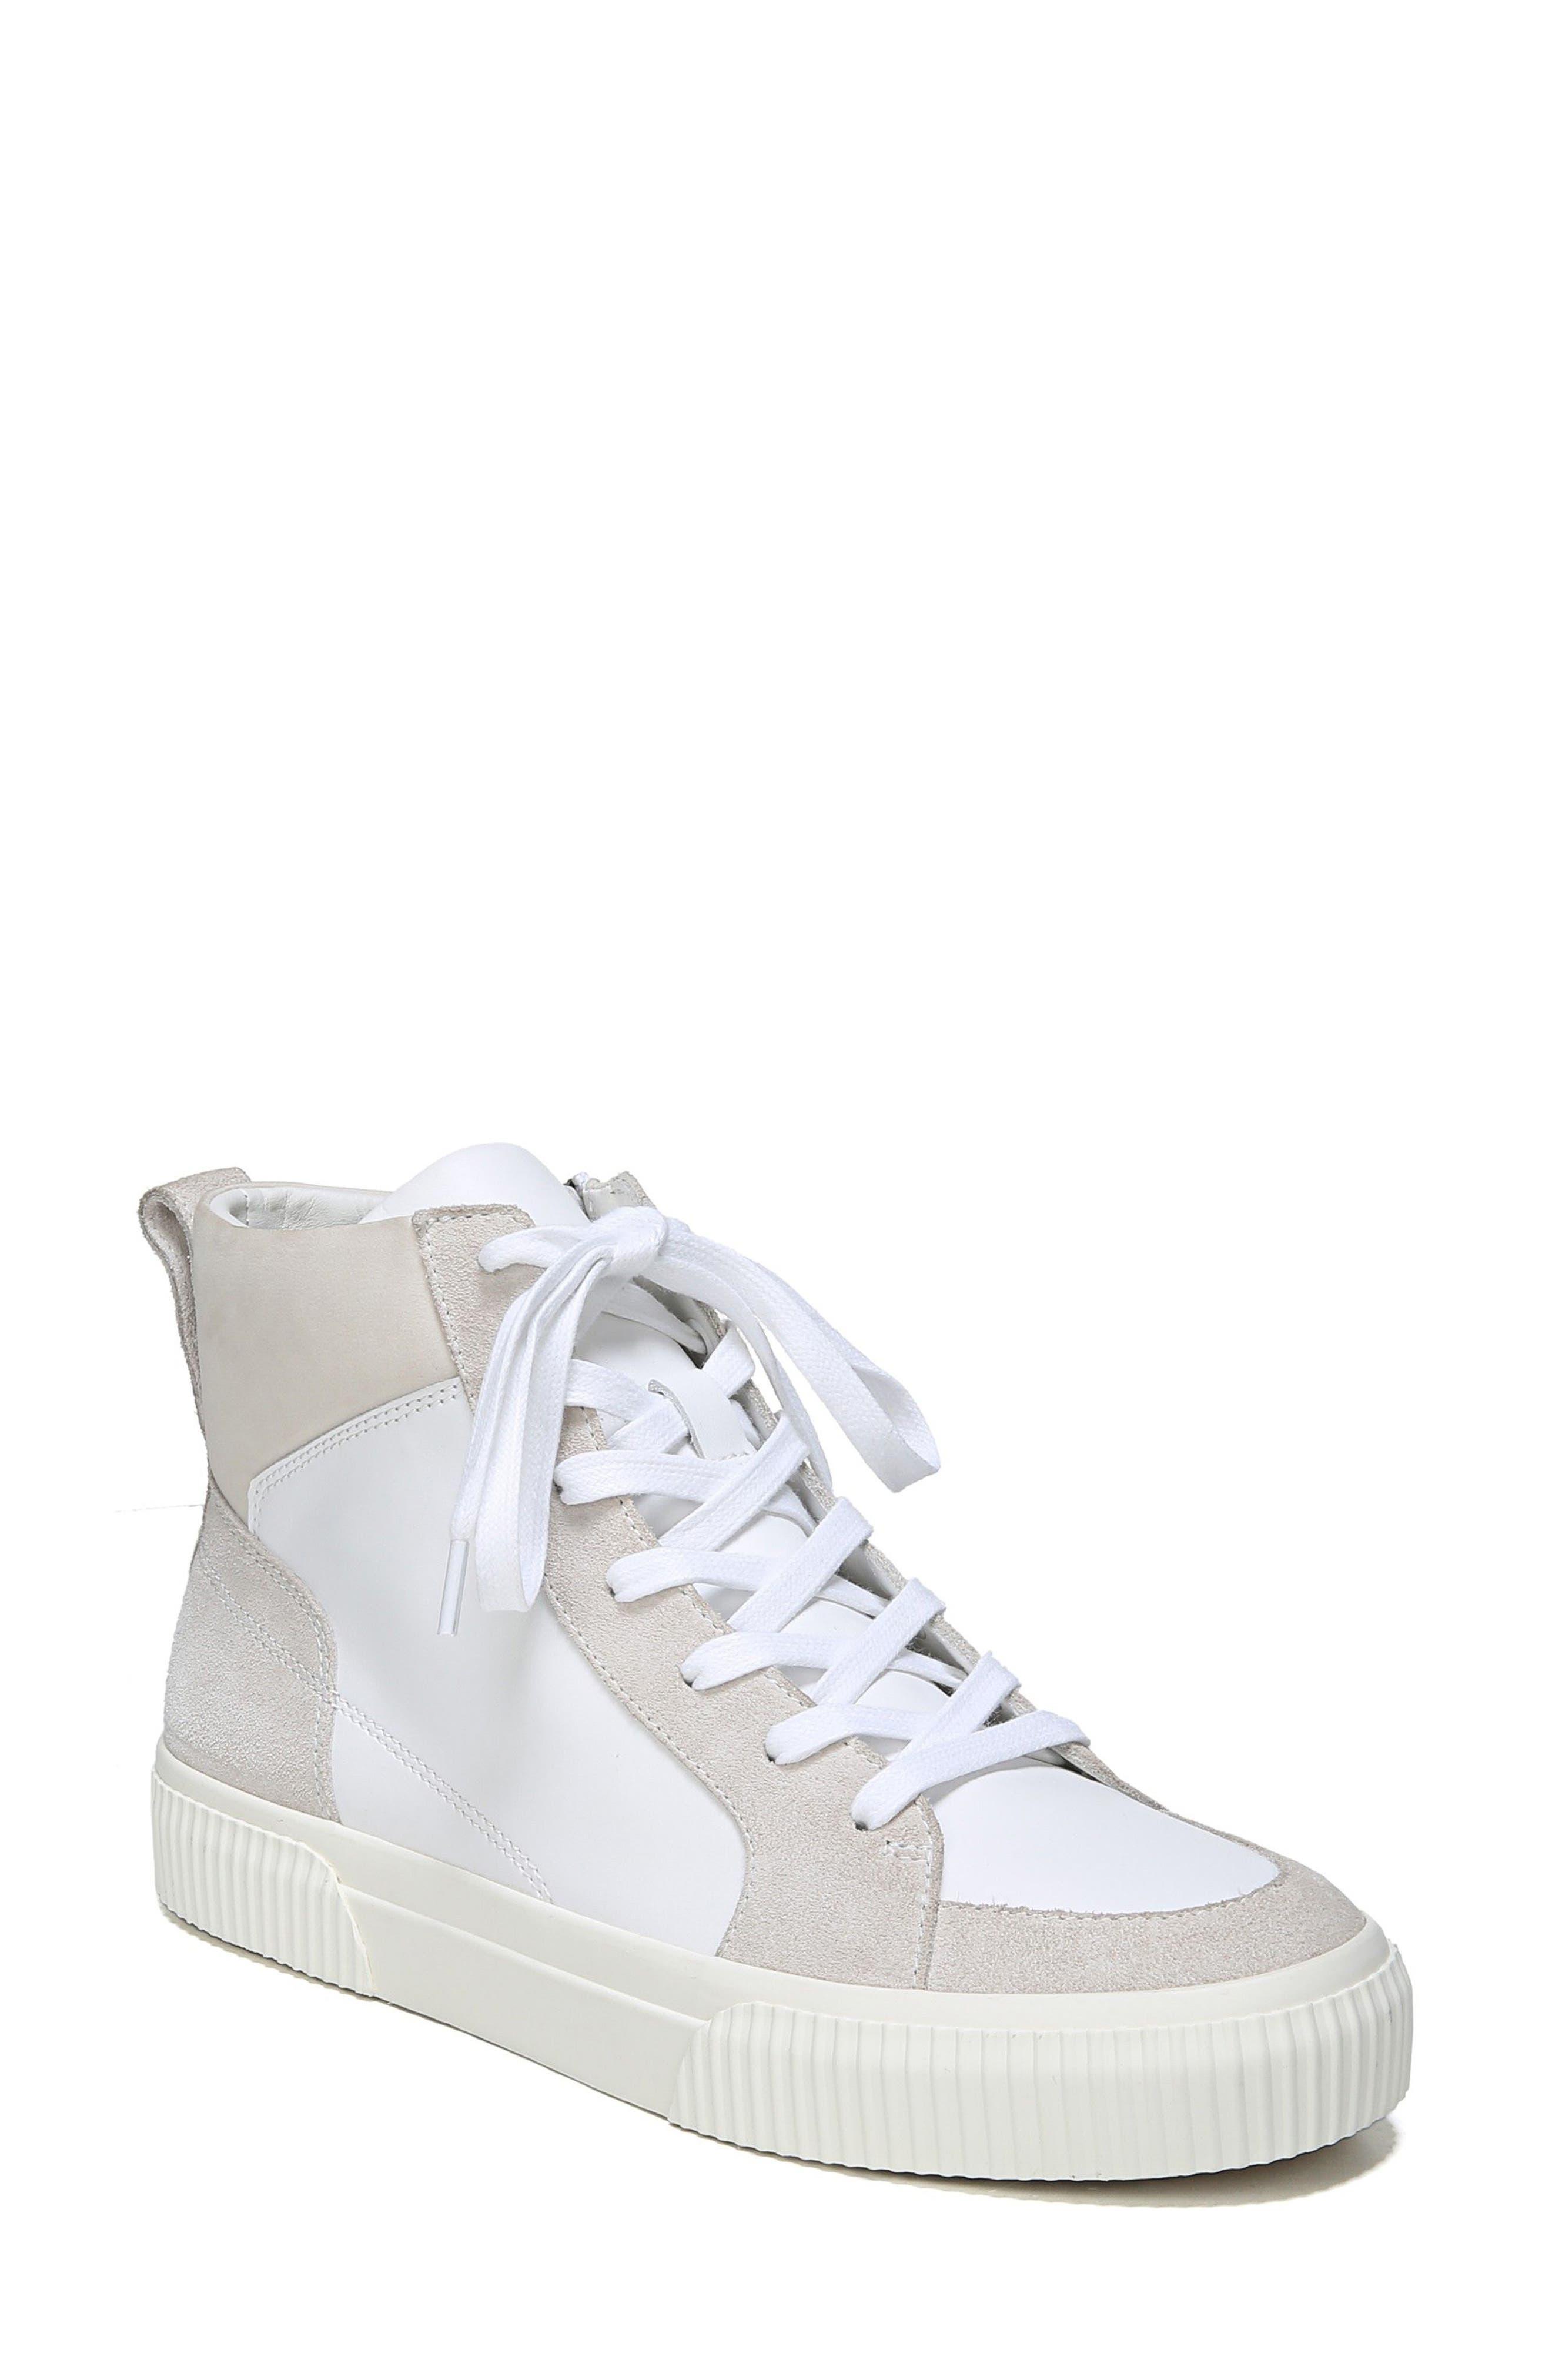 Kiles High-Top Sneaker,                             Main thumbnail 1, color,                             100